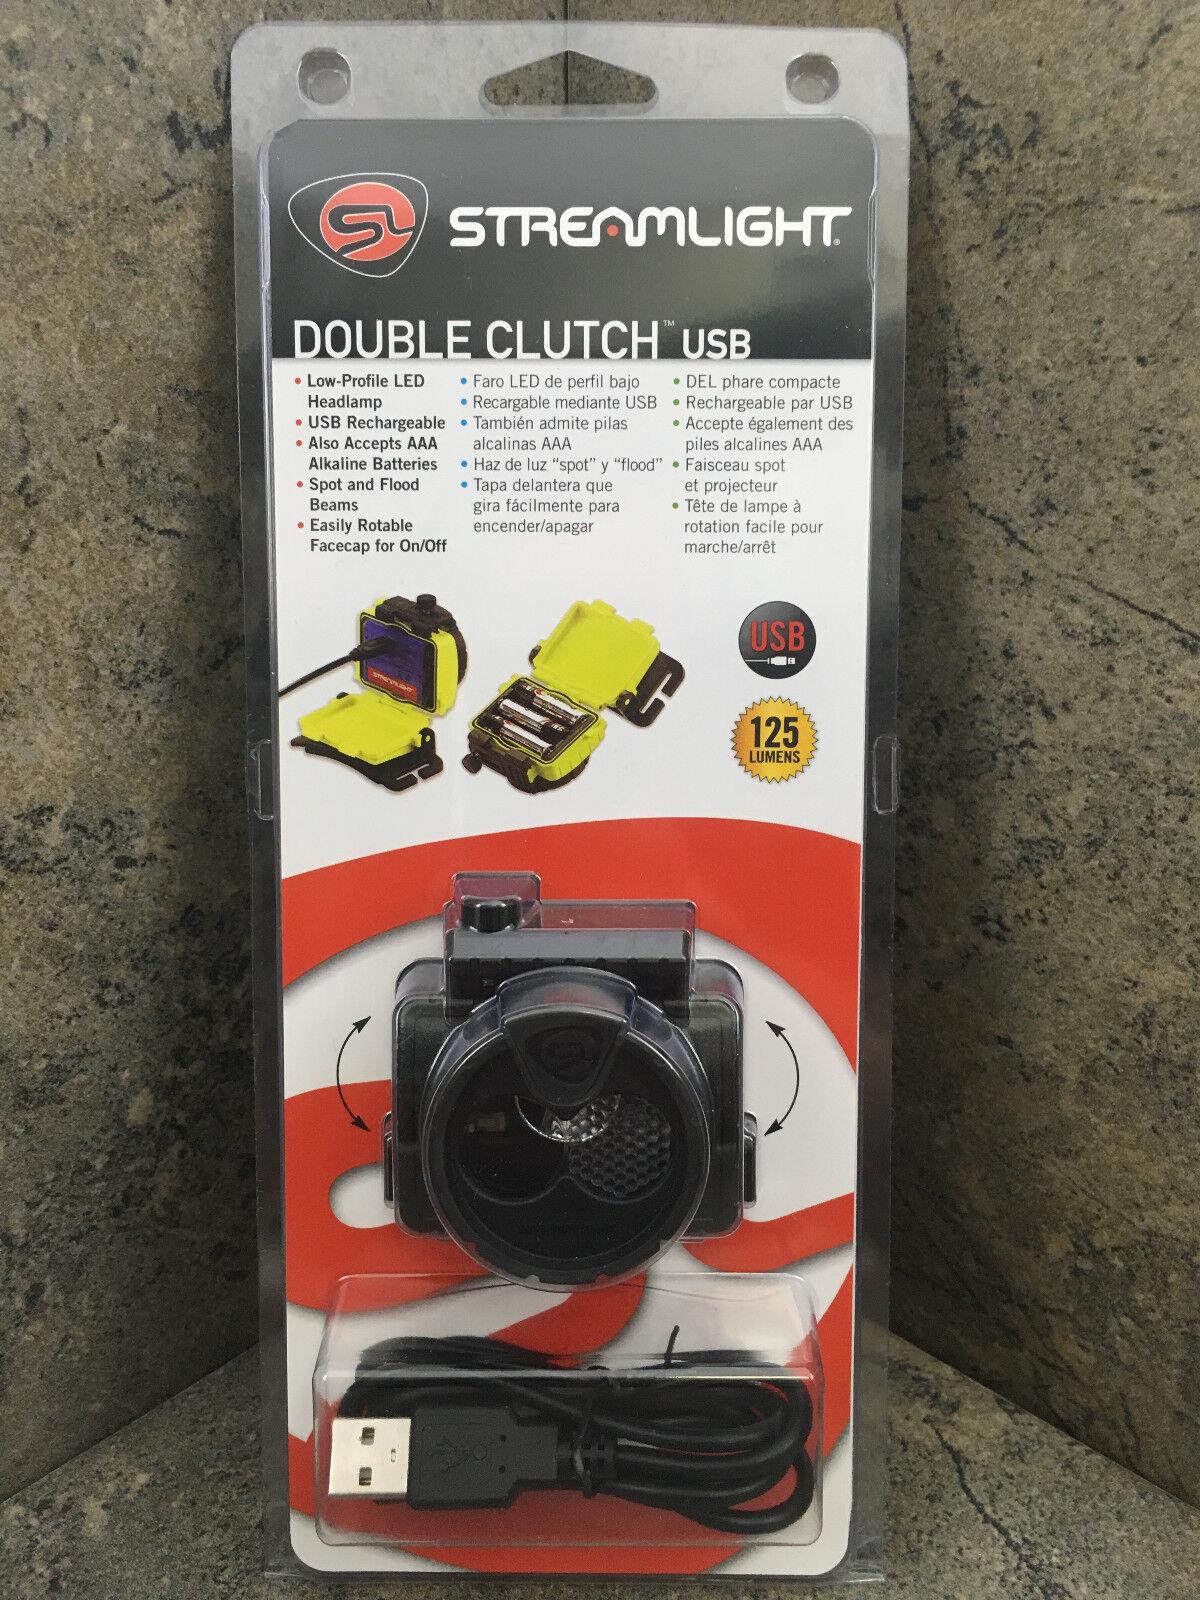 Strea ight 61603 Double  Clutch USB Headlamp Flashlight  125 lumens 120V AC Adap  online fashion shopping